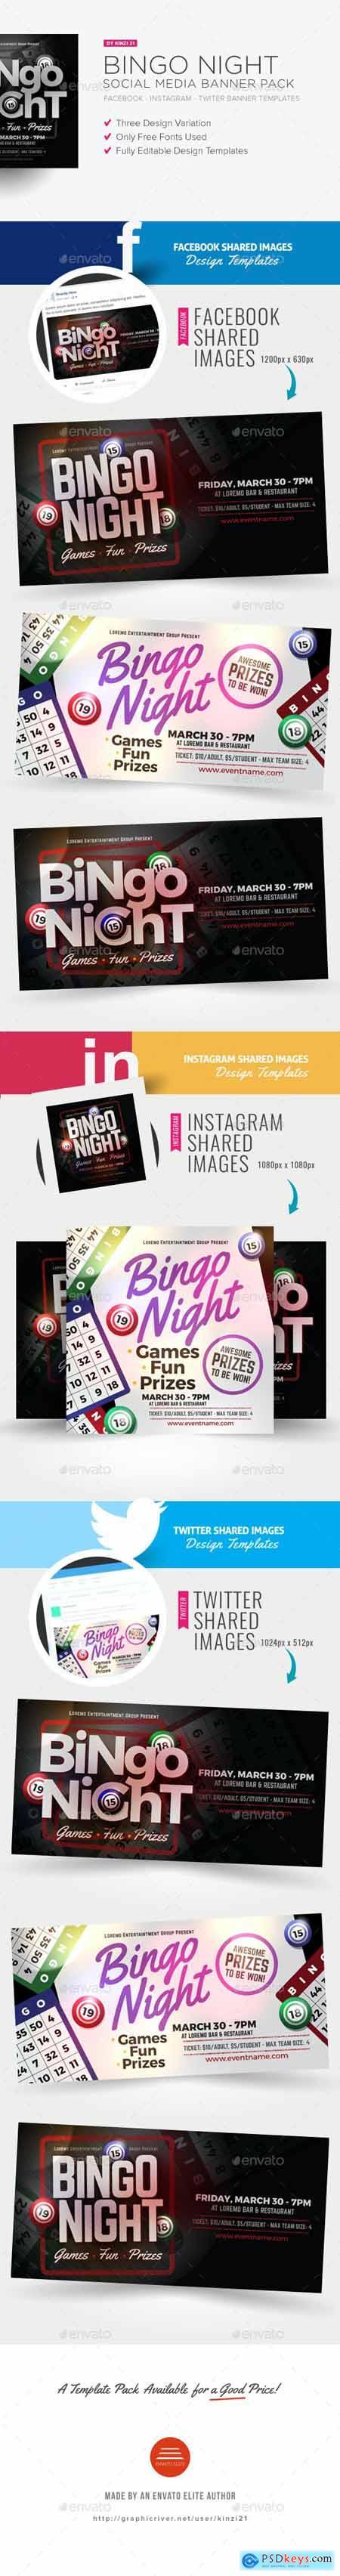 Bingo Night Social Media Banner Pack 20568879